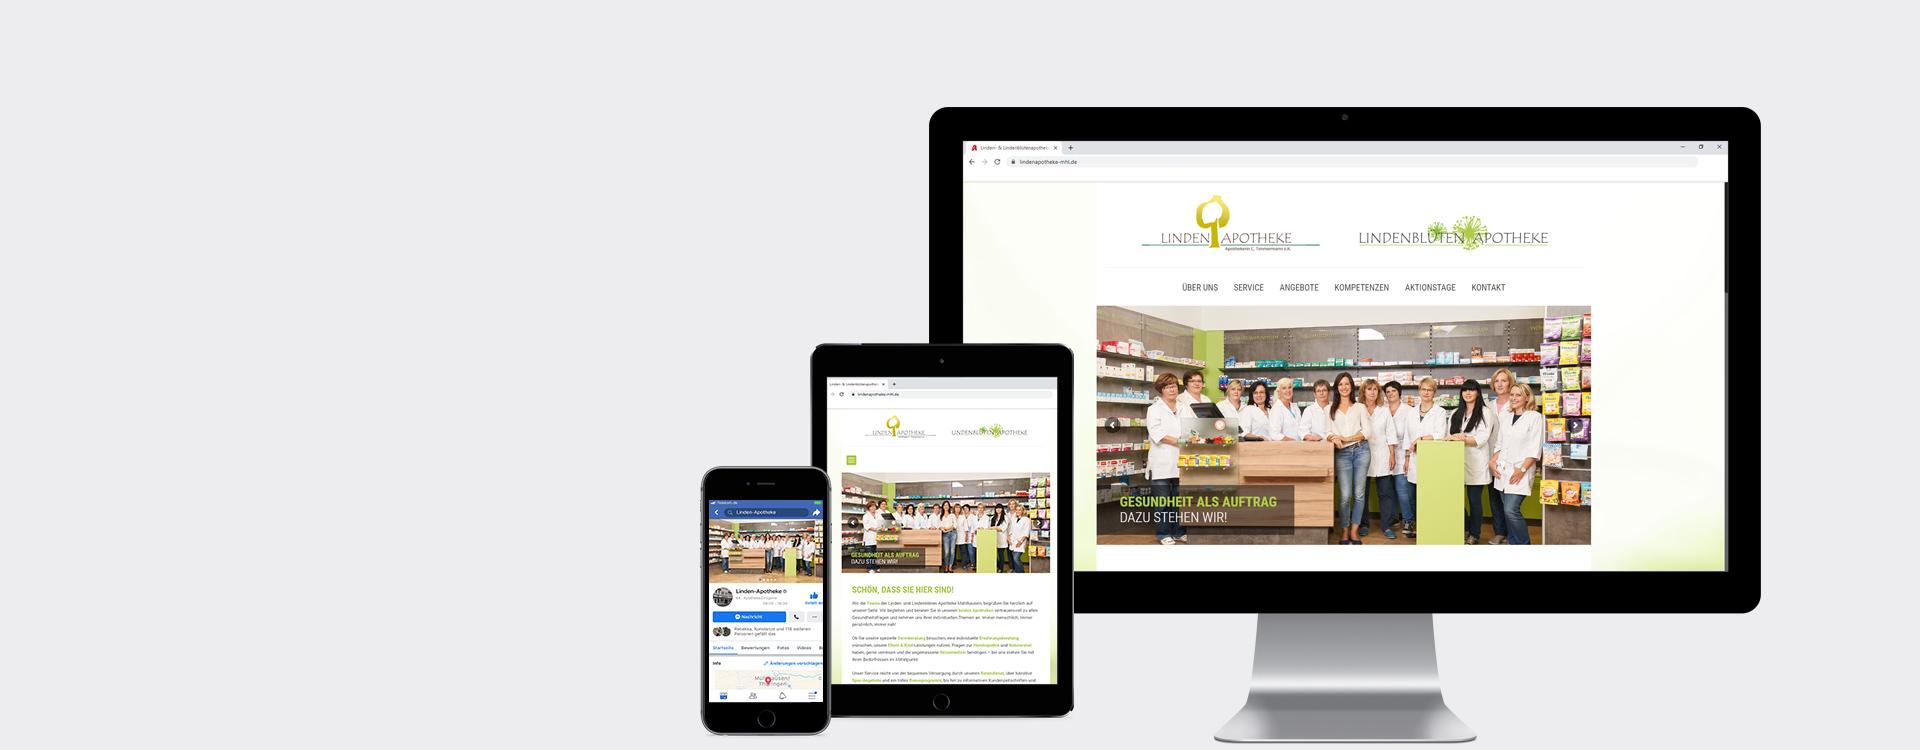 thor marketing: Onlinemarketing